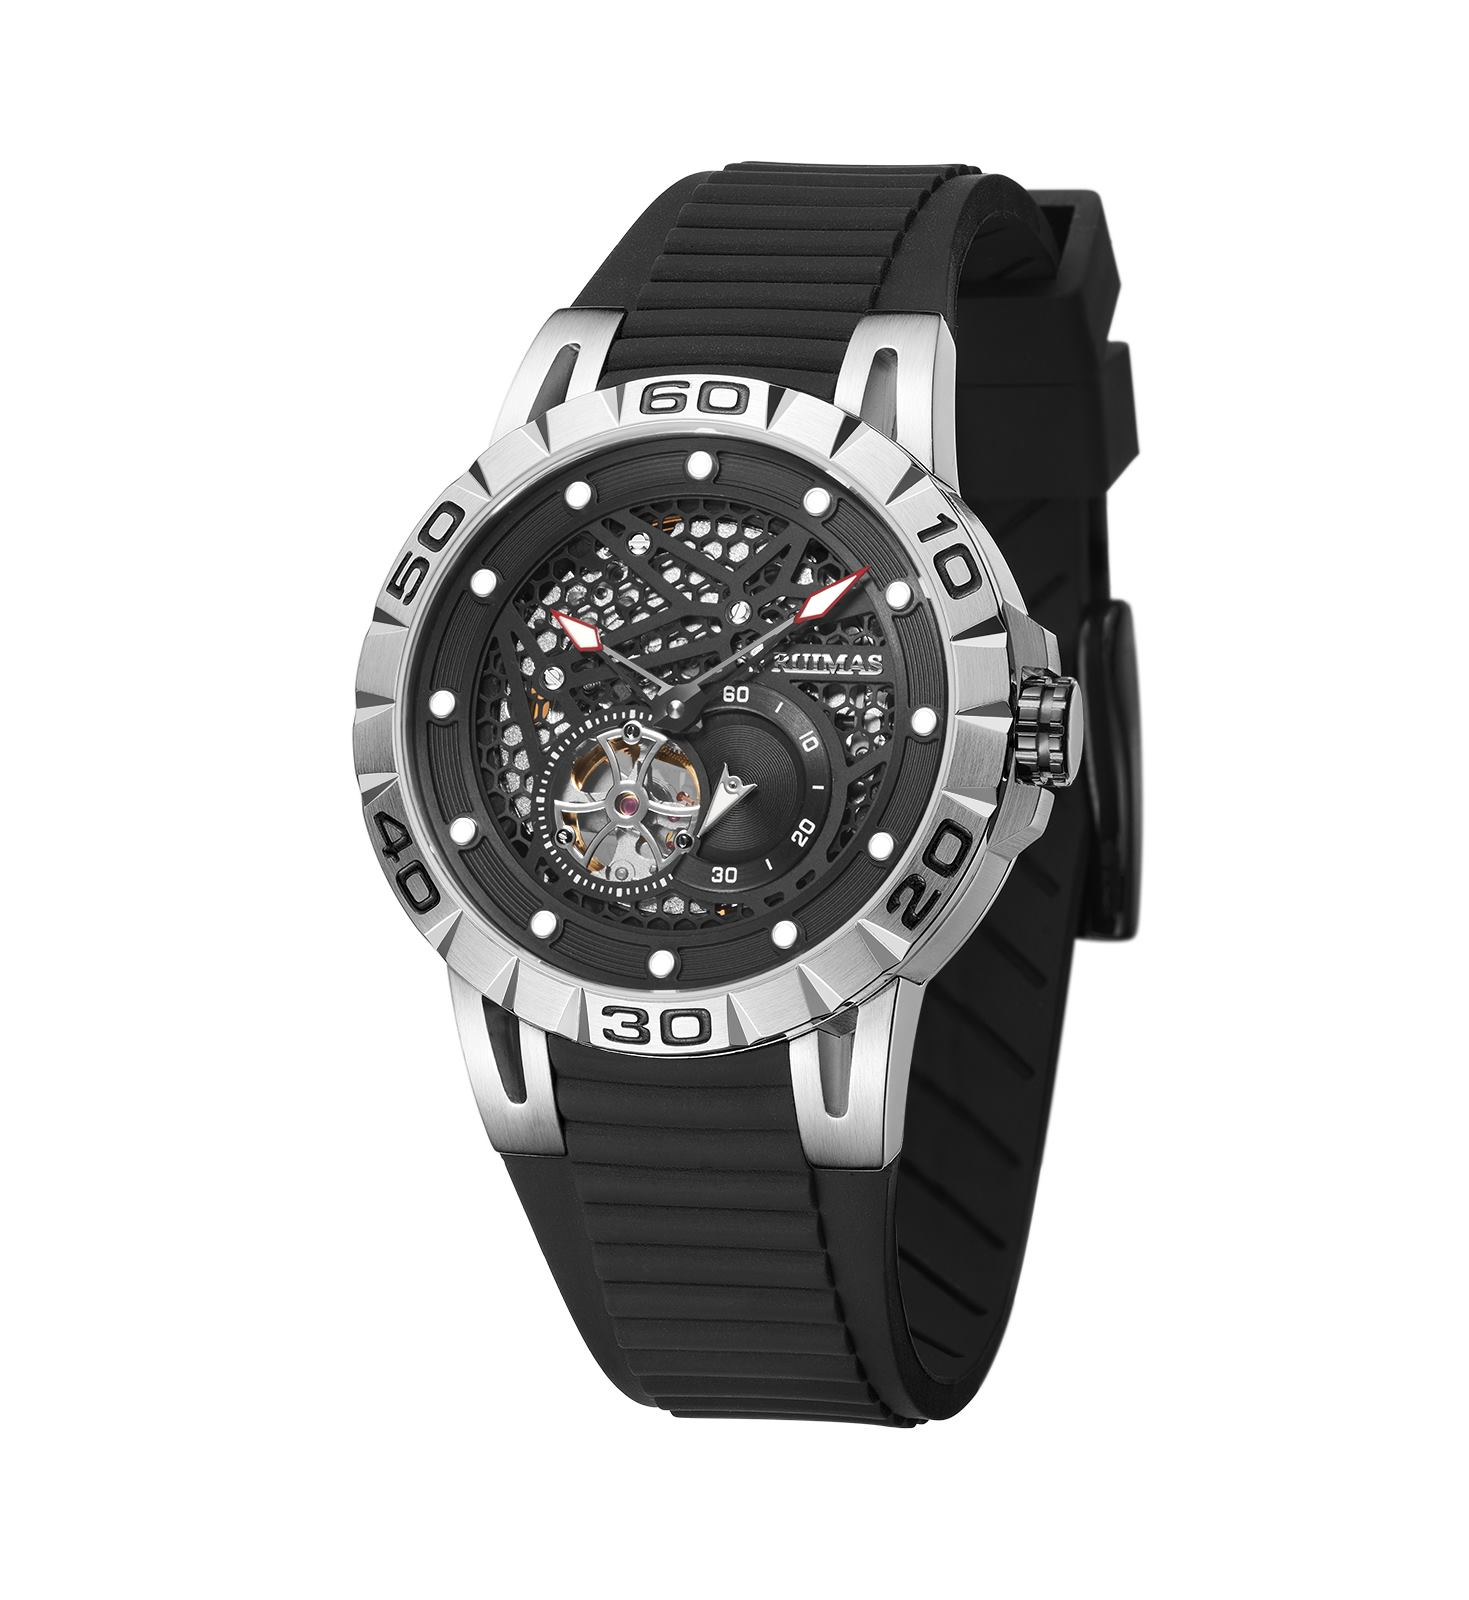 Men Watch Top Brand Luxury 2019 Ruimas Mechanical Wristwatch Rubber Strap Sport Chronograph Dial Clock Reloj Hombre 6772